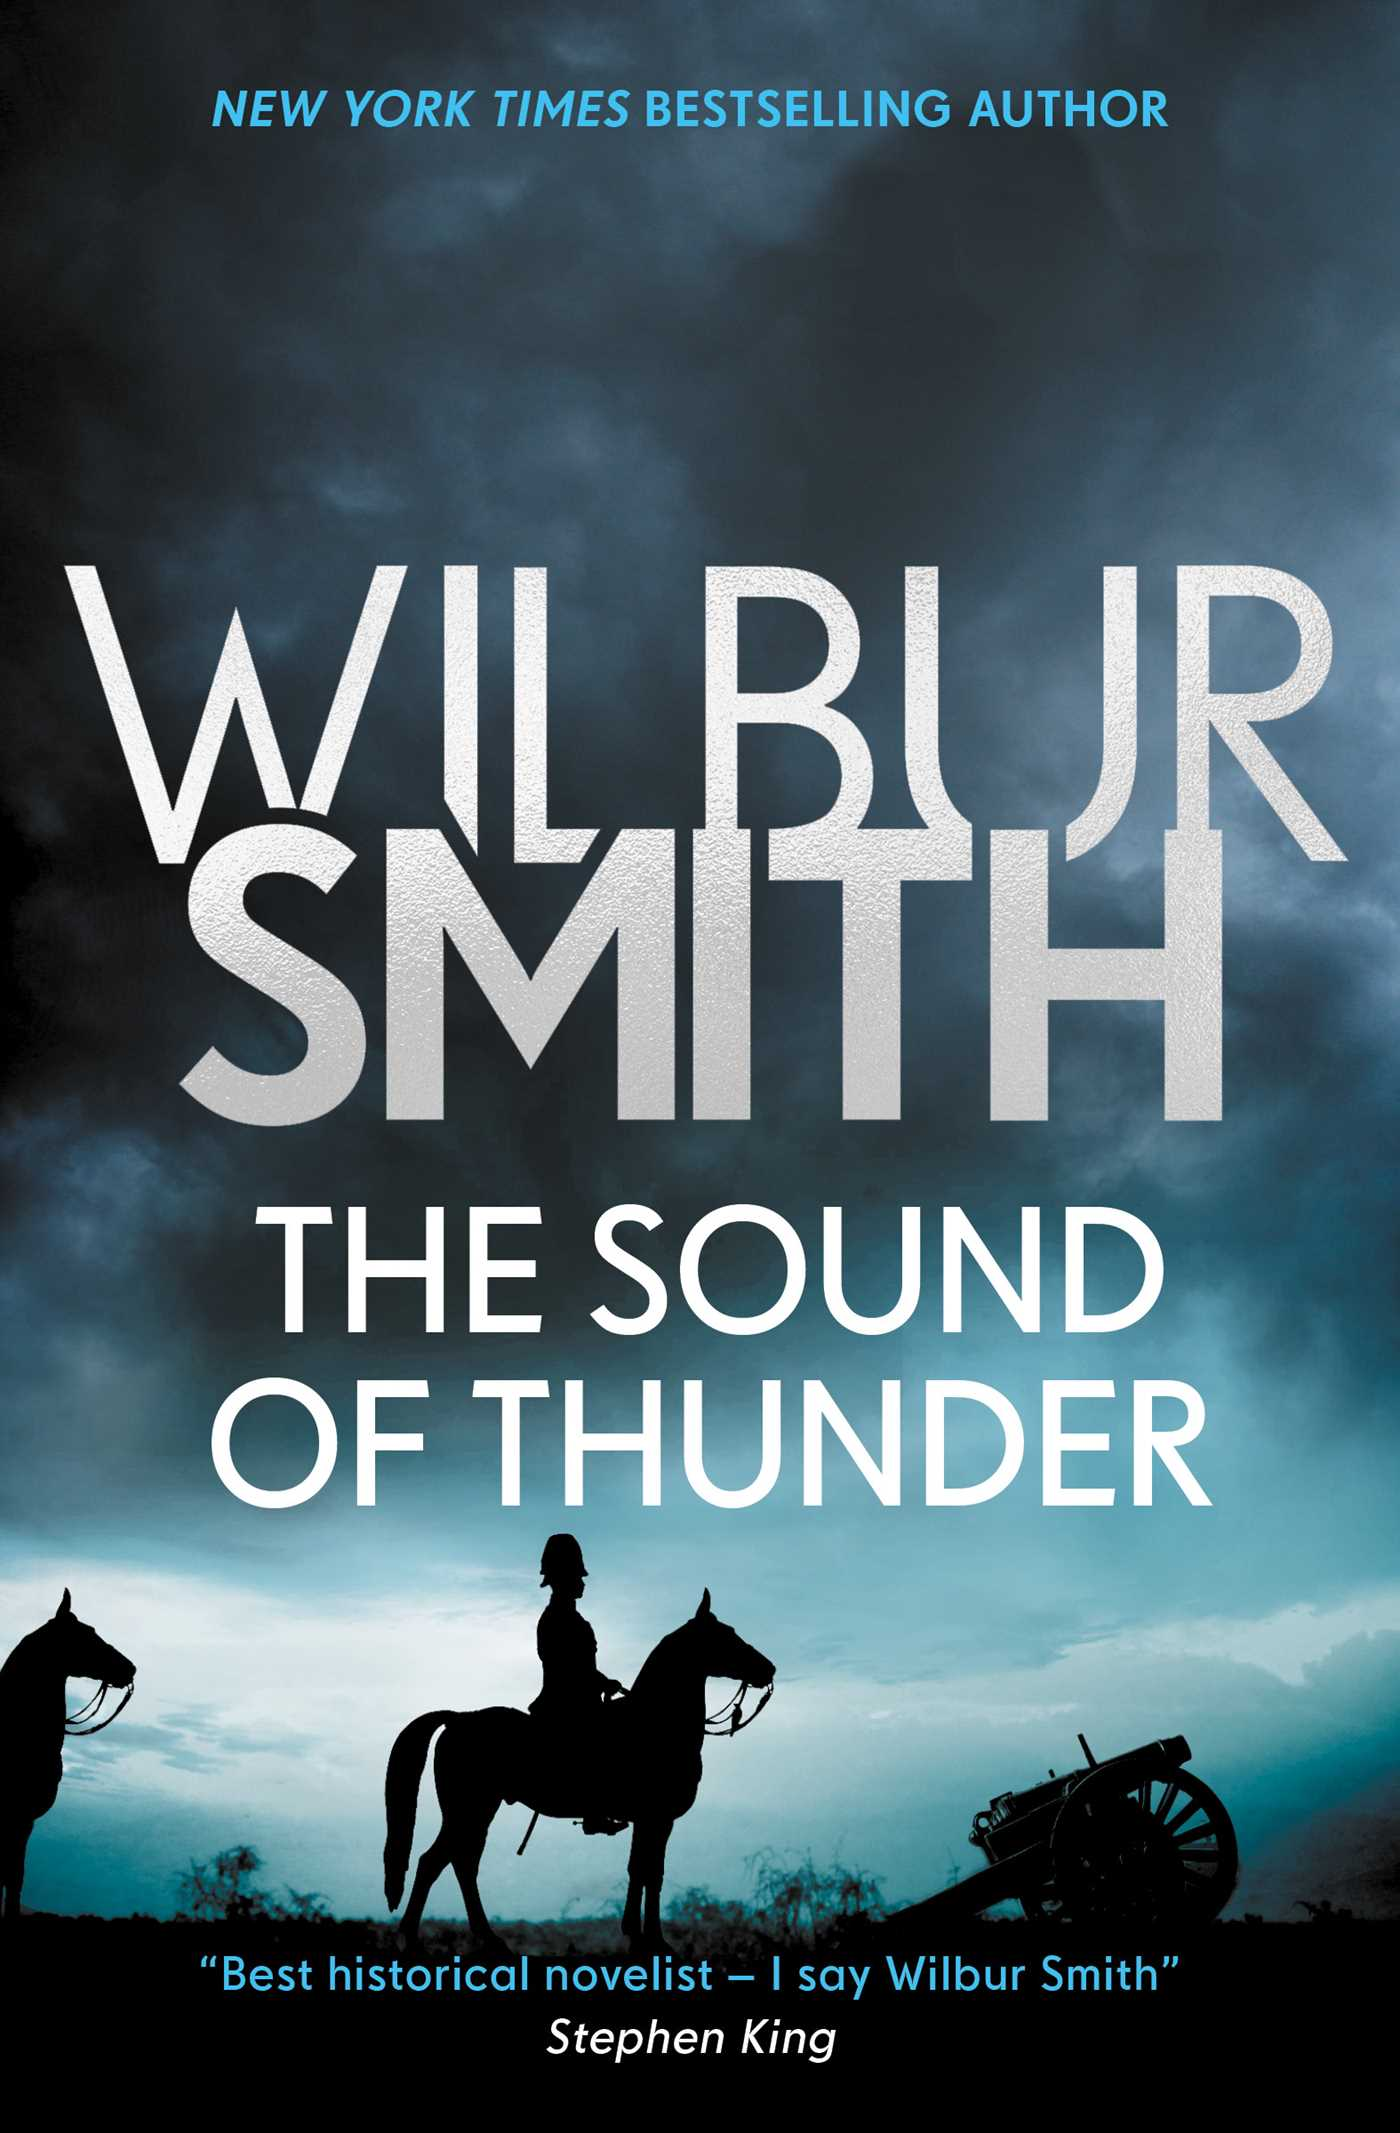 The sound of thunder 9781499860115 hr